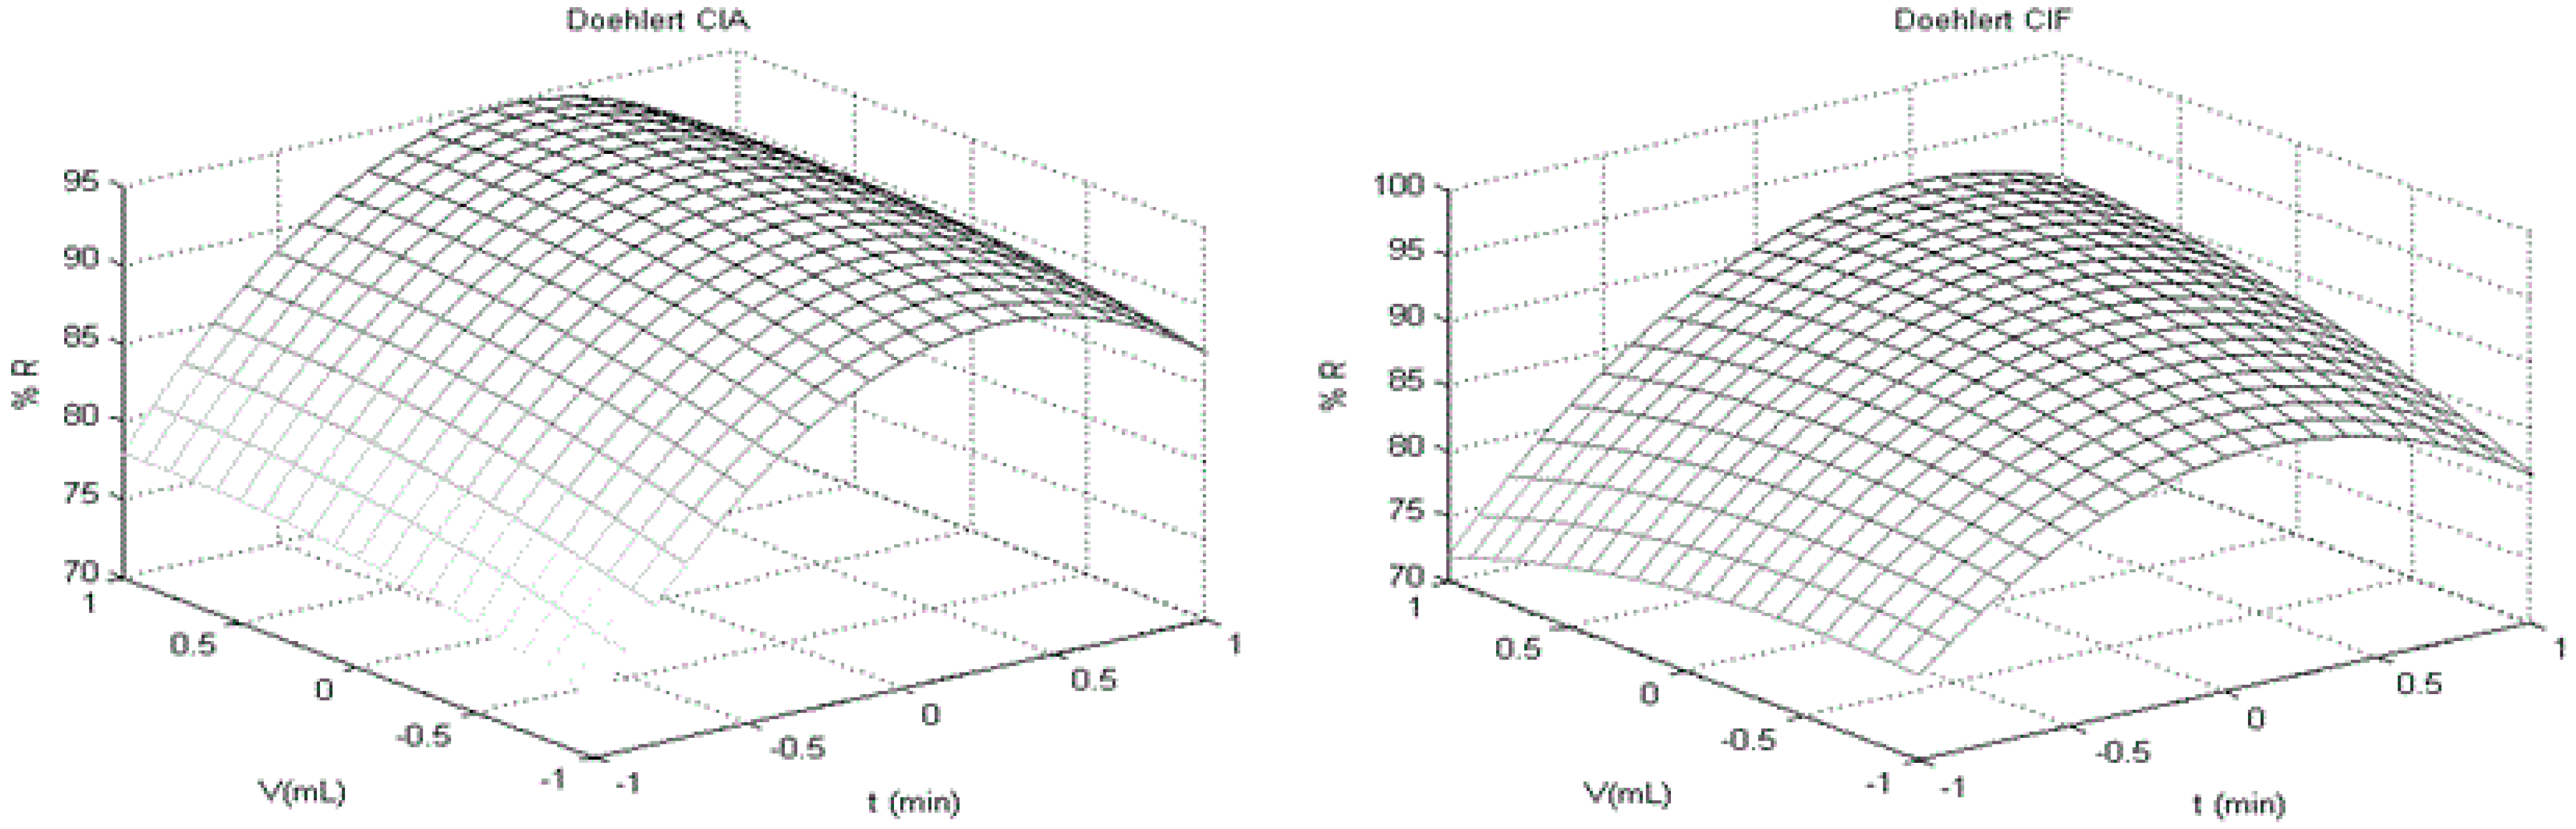 IJERPH | Free Full-Text | Multivariate Optimization for